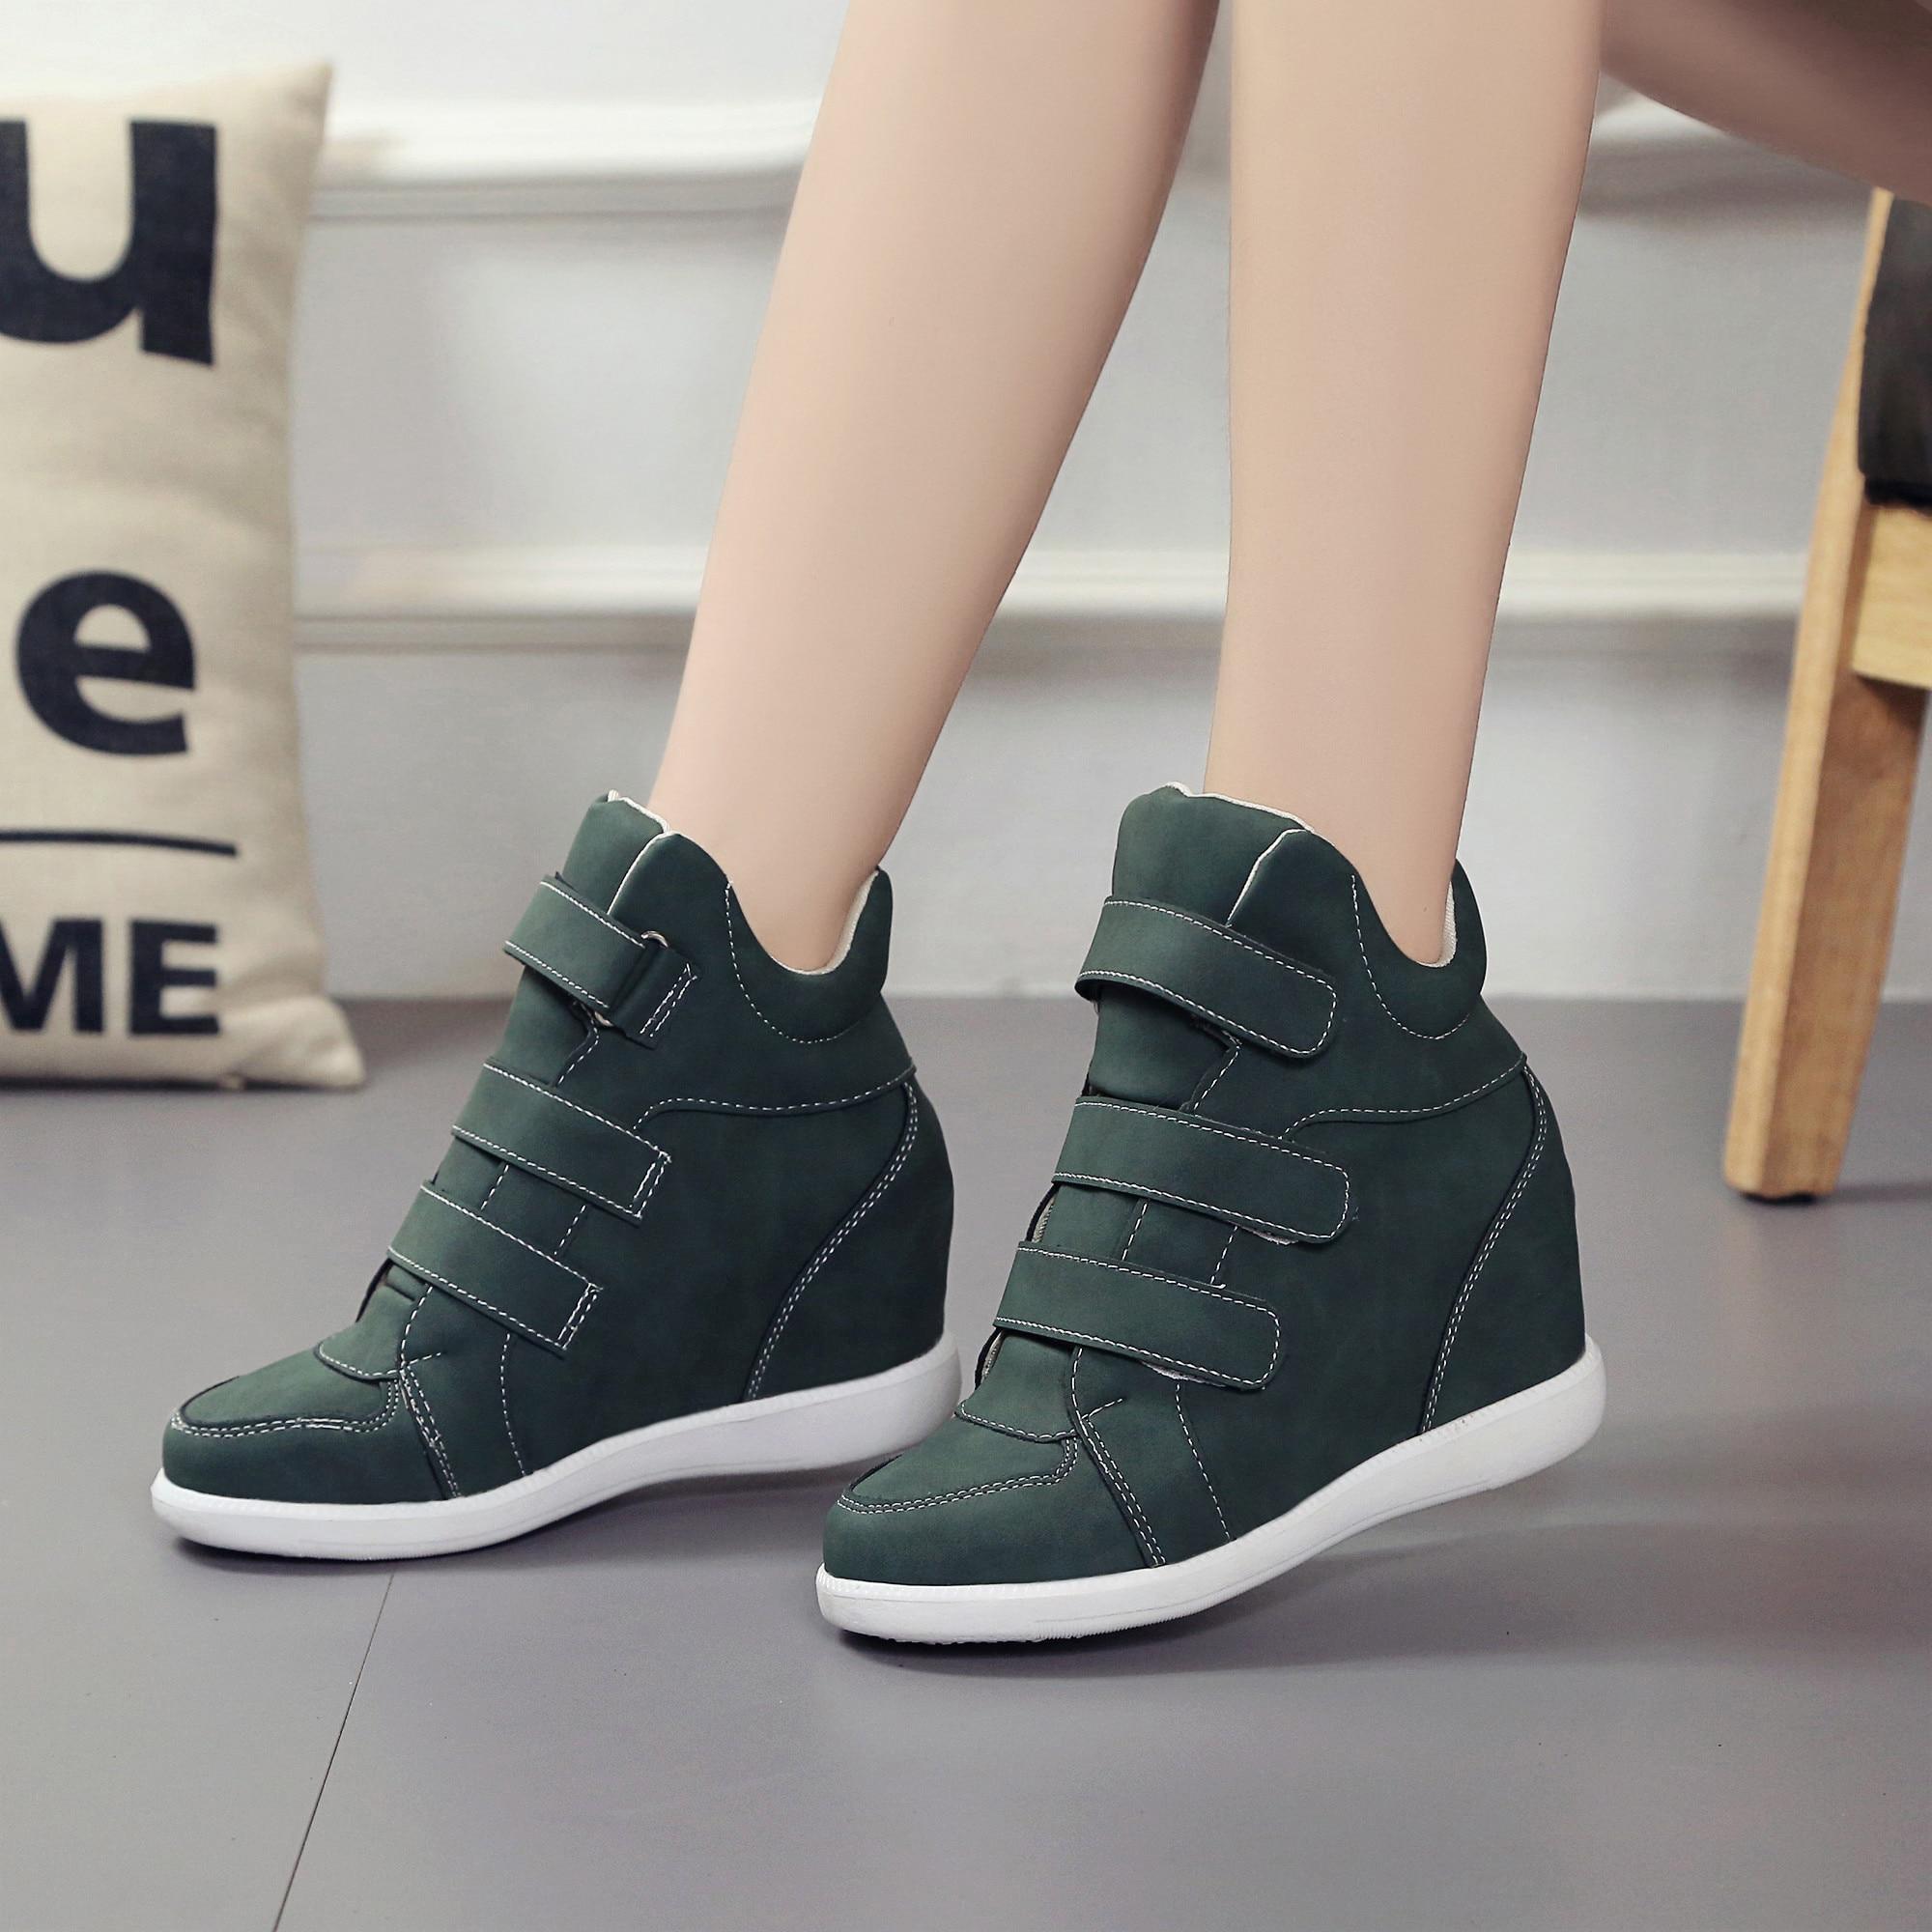 Lucyever mode plate-forme chaussures Femme bottines dissimulées compensées confort baskets Femme troupeau chaussures décontractées Chaussure Femme